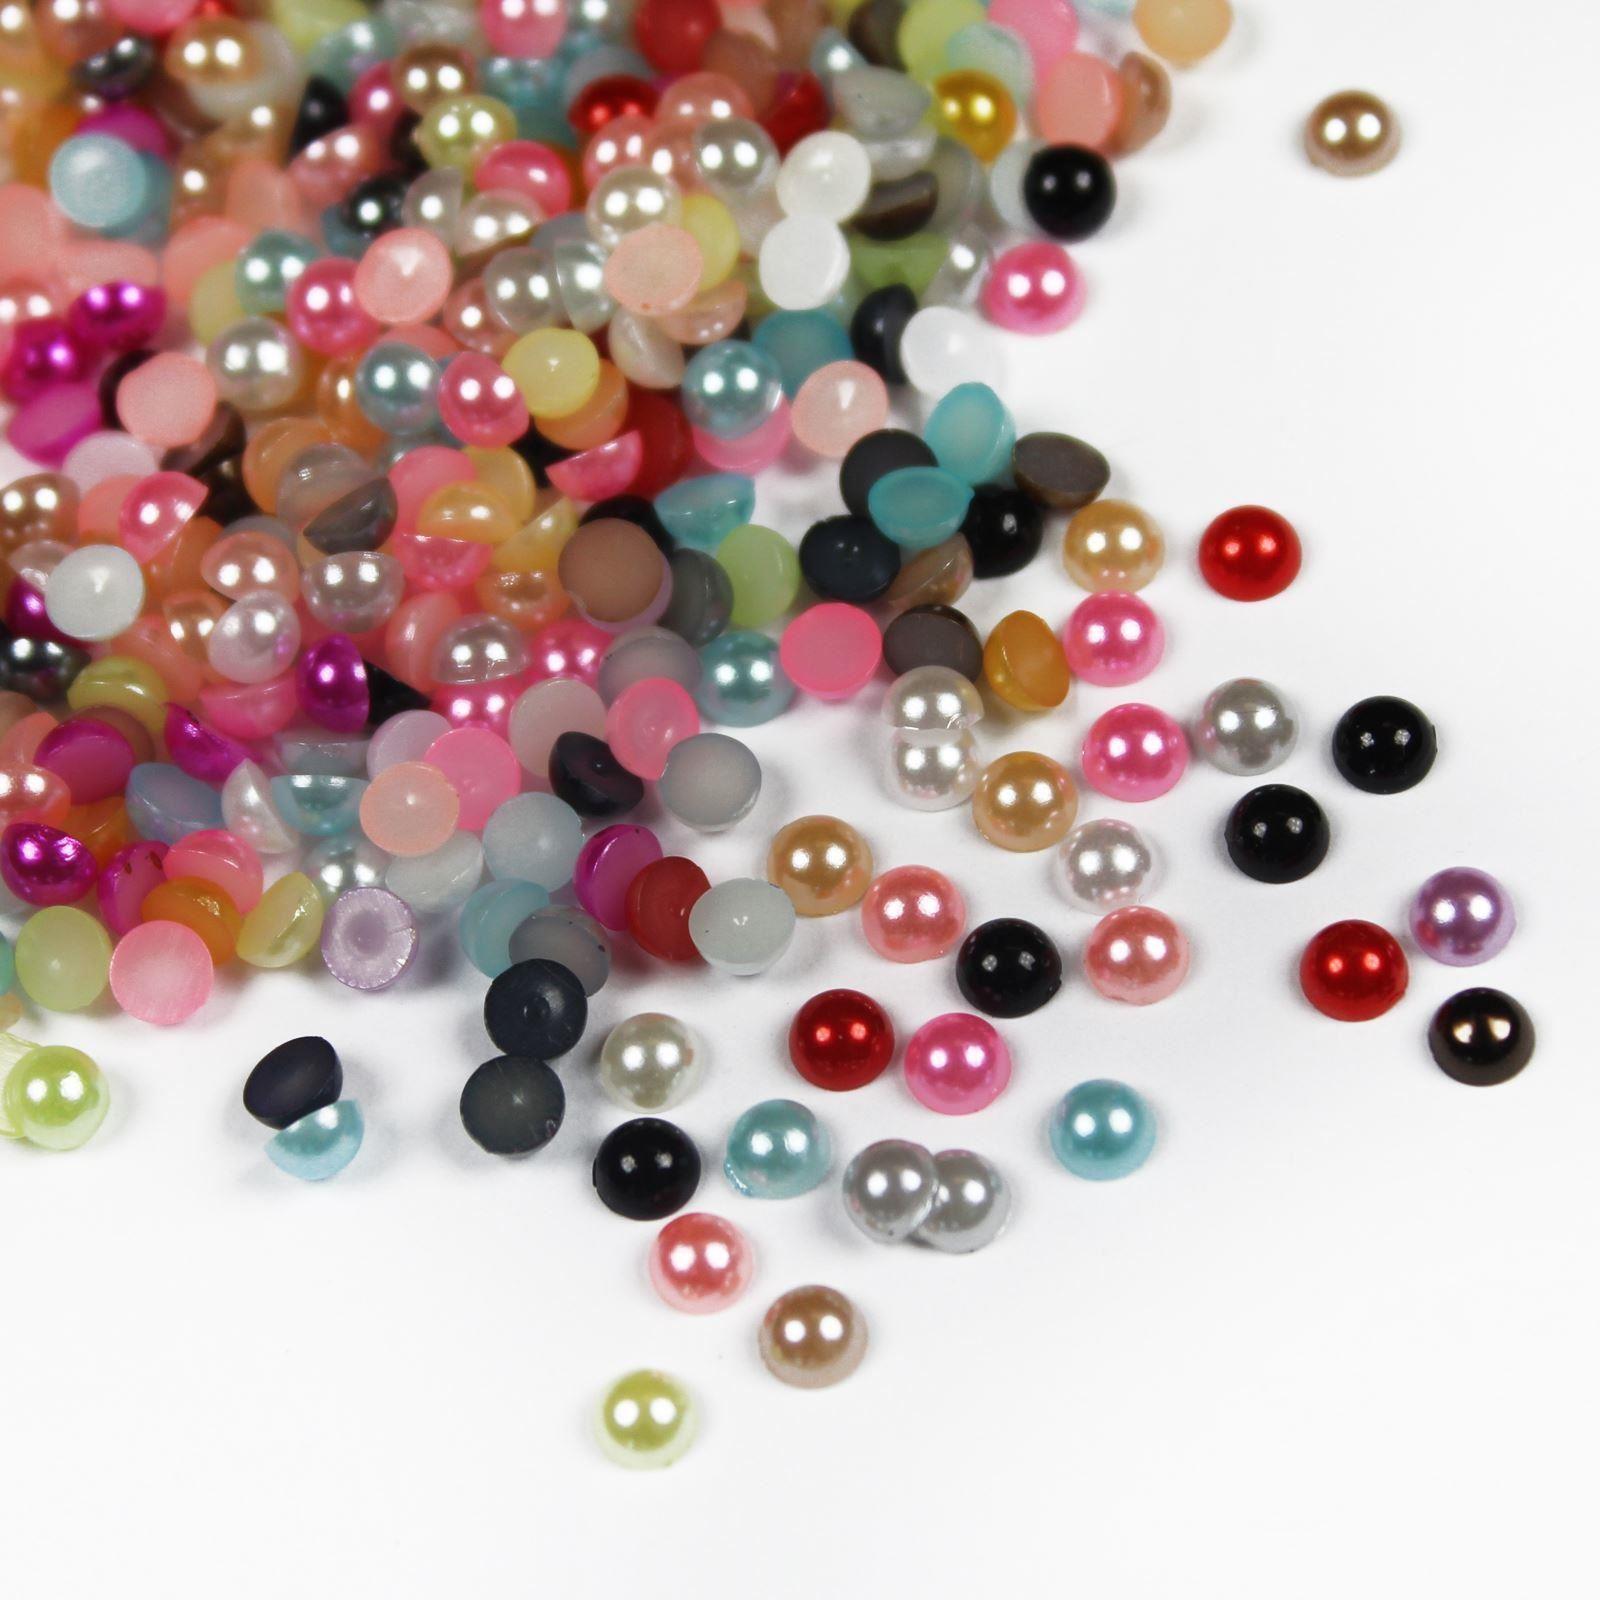 1000-High-Quality-Flat-Back-Half-Round-Pearls-Nail-Art-Craft-Face-Embellishment thumbnail 21